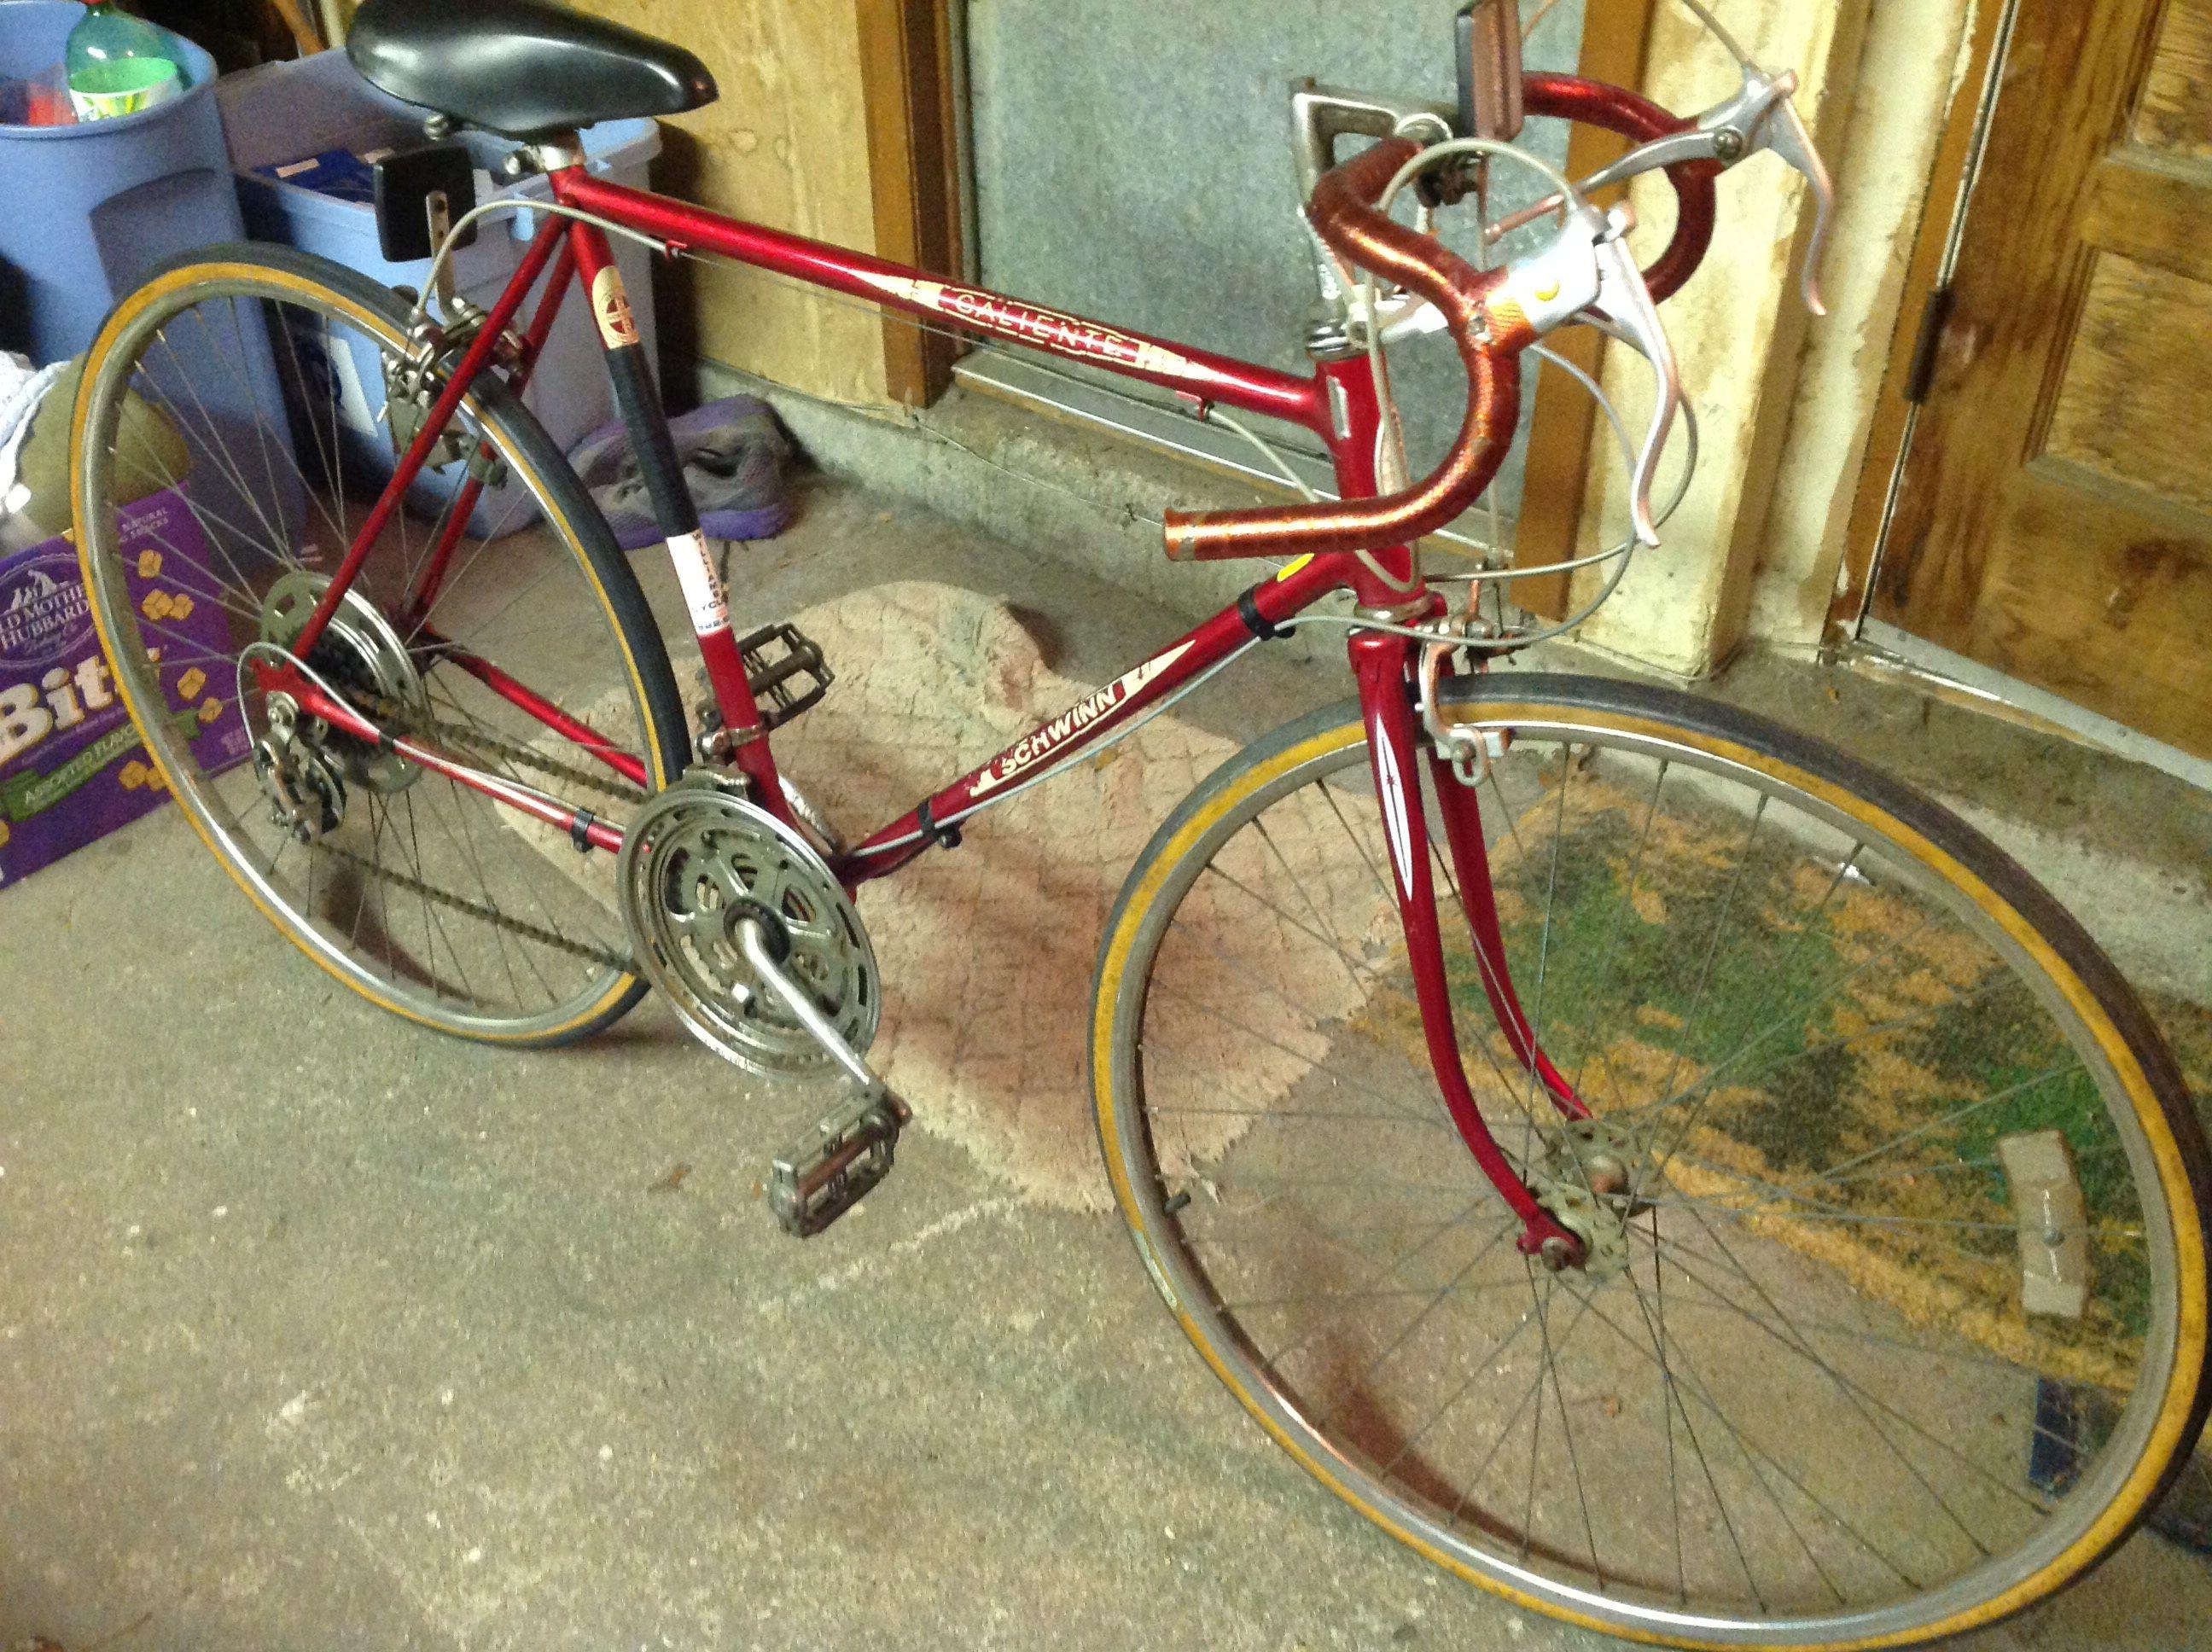 Vintage 1979 Schwinn Caliente 10 Speed Bike